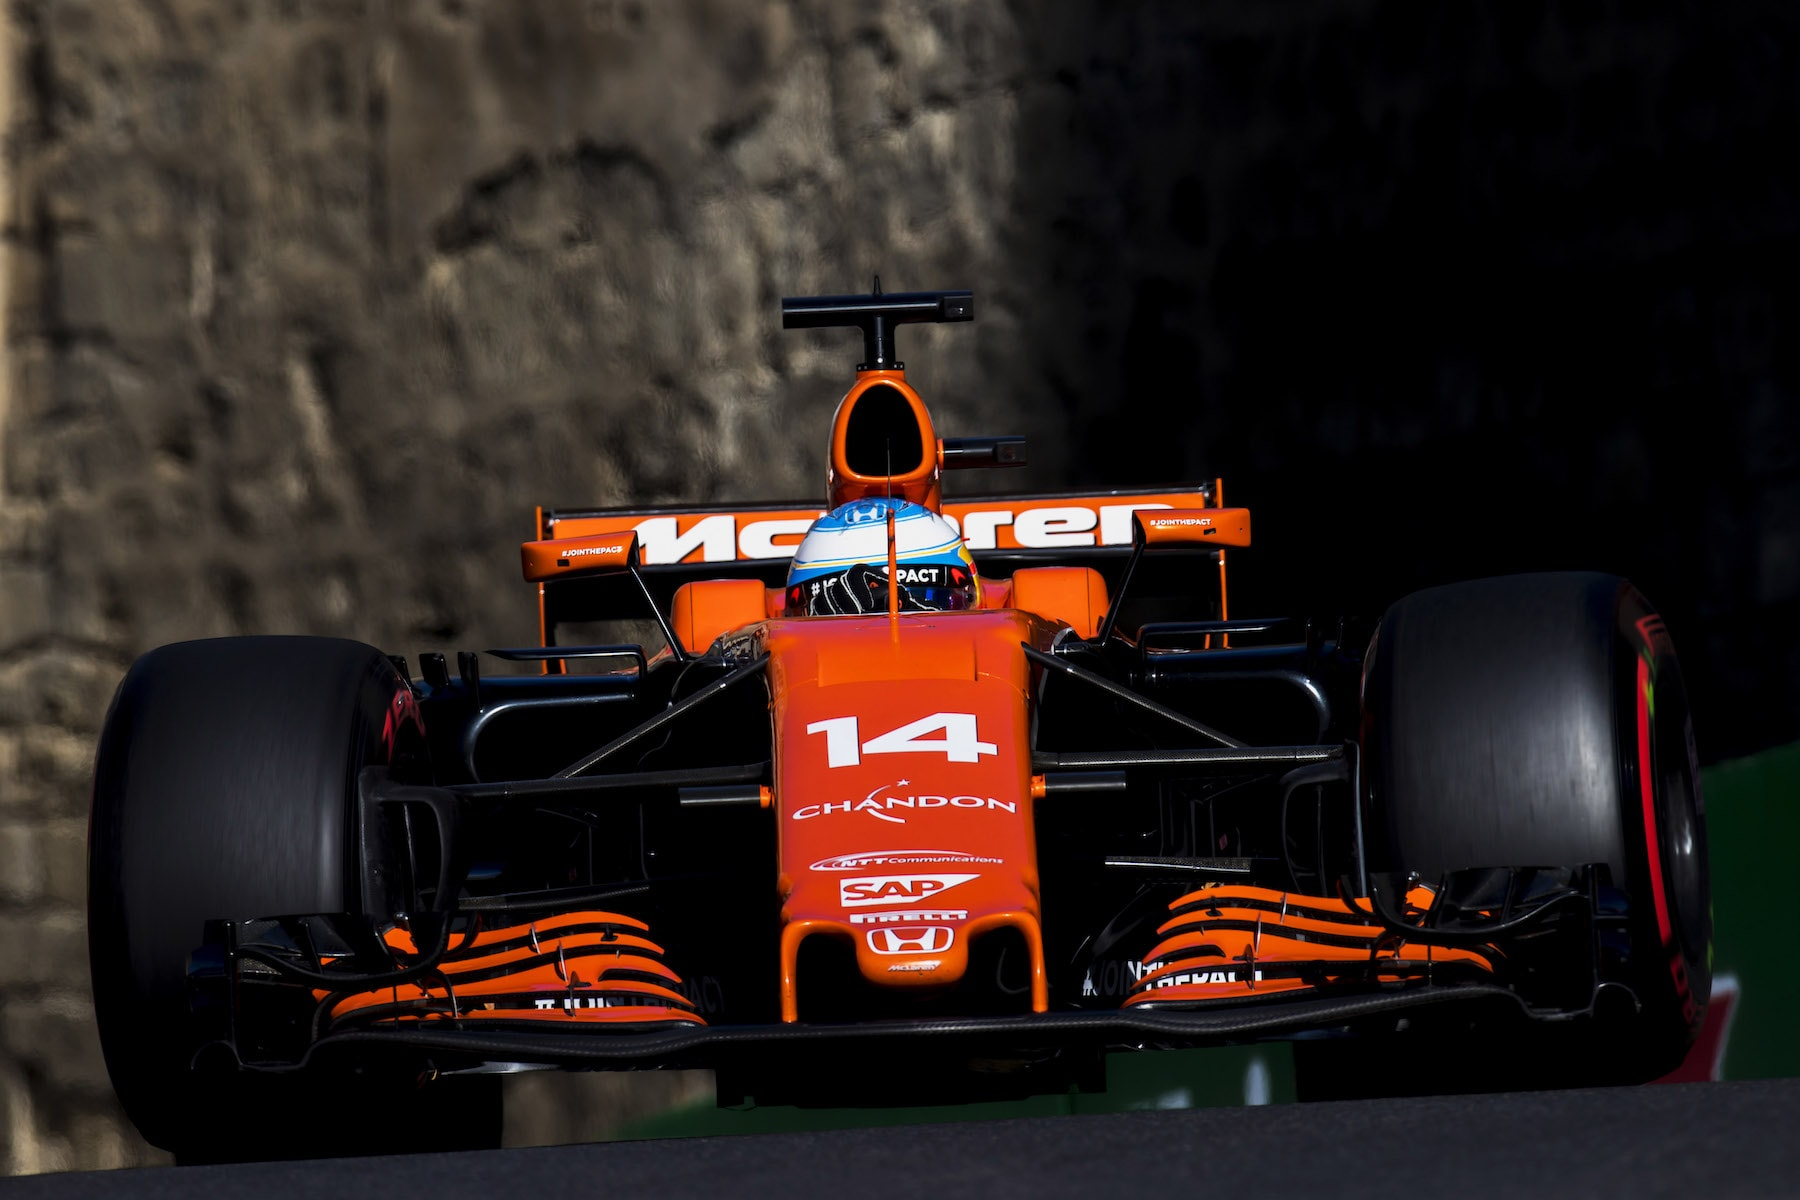 G 2017 Fernando Alonso | McLaren MCL32 | 2017 Azerbaijan GP P9 2 copy.jpg